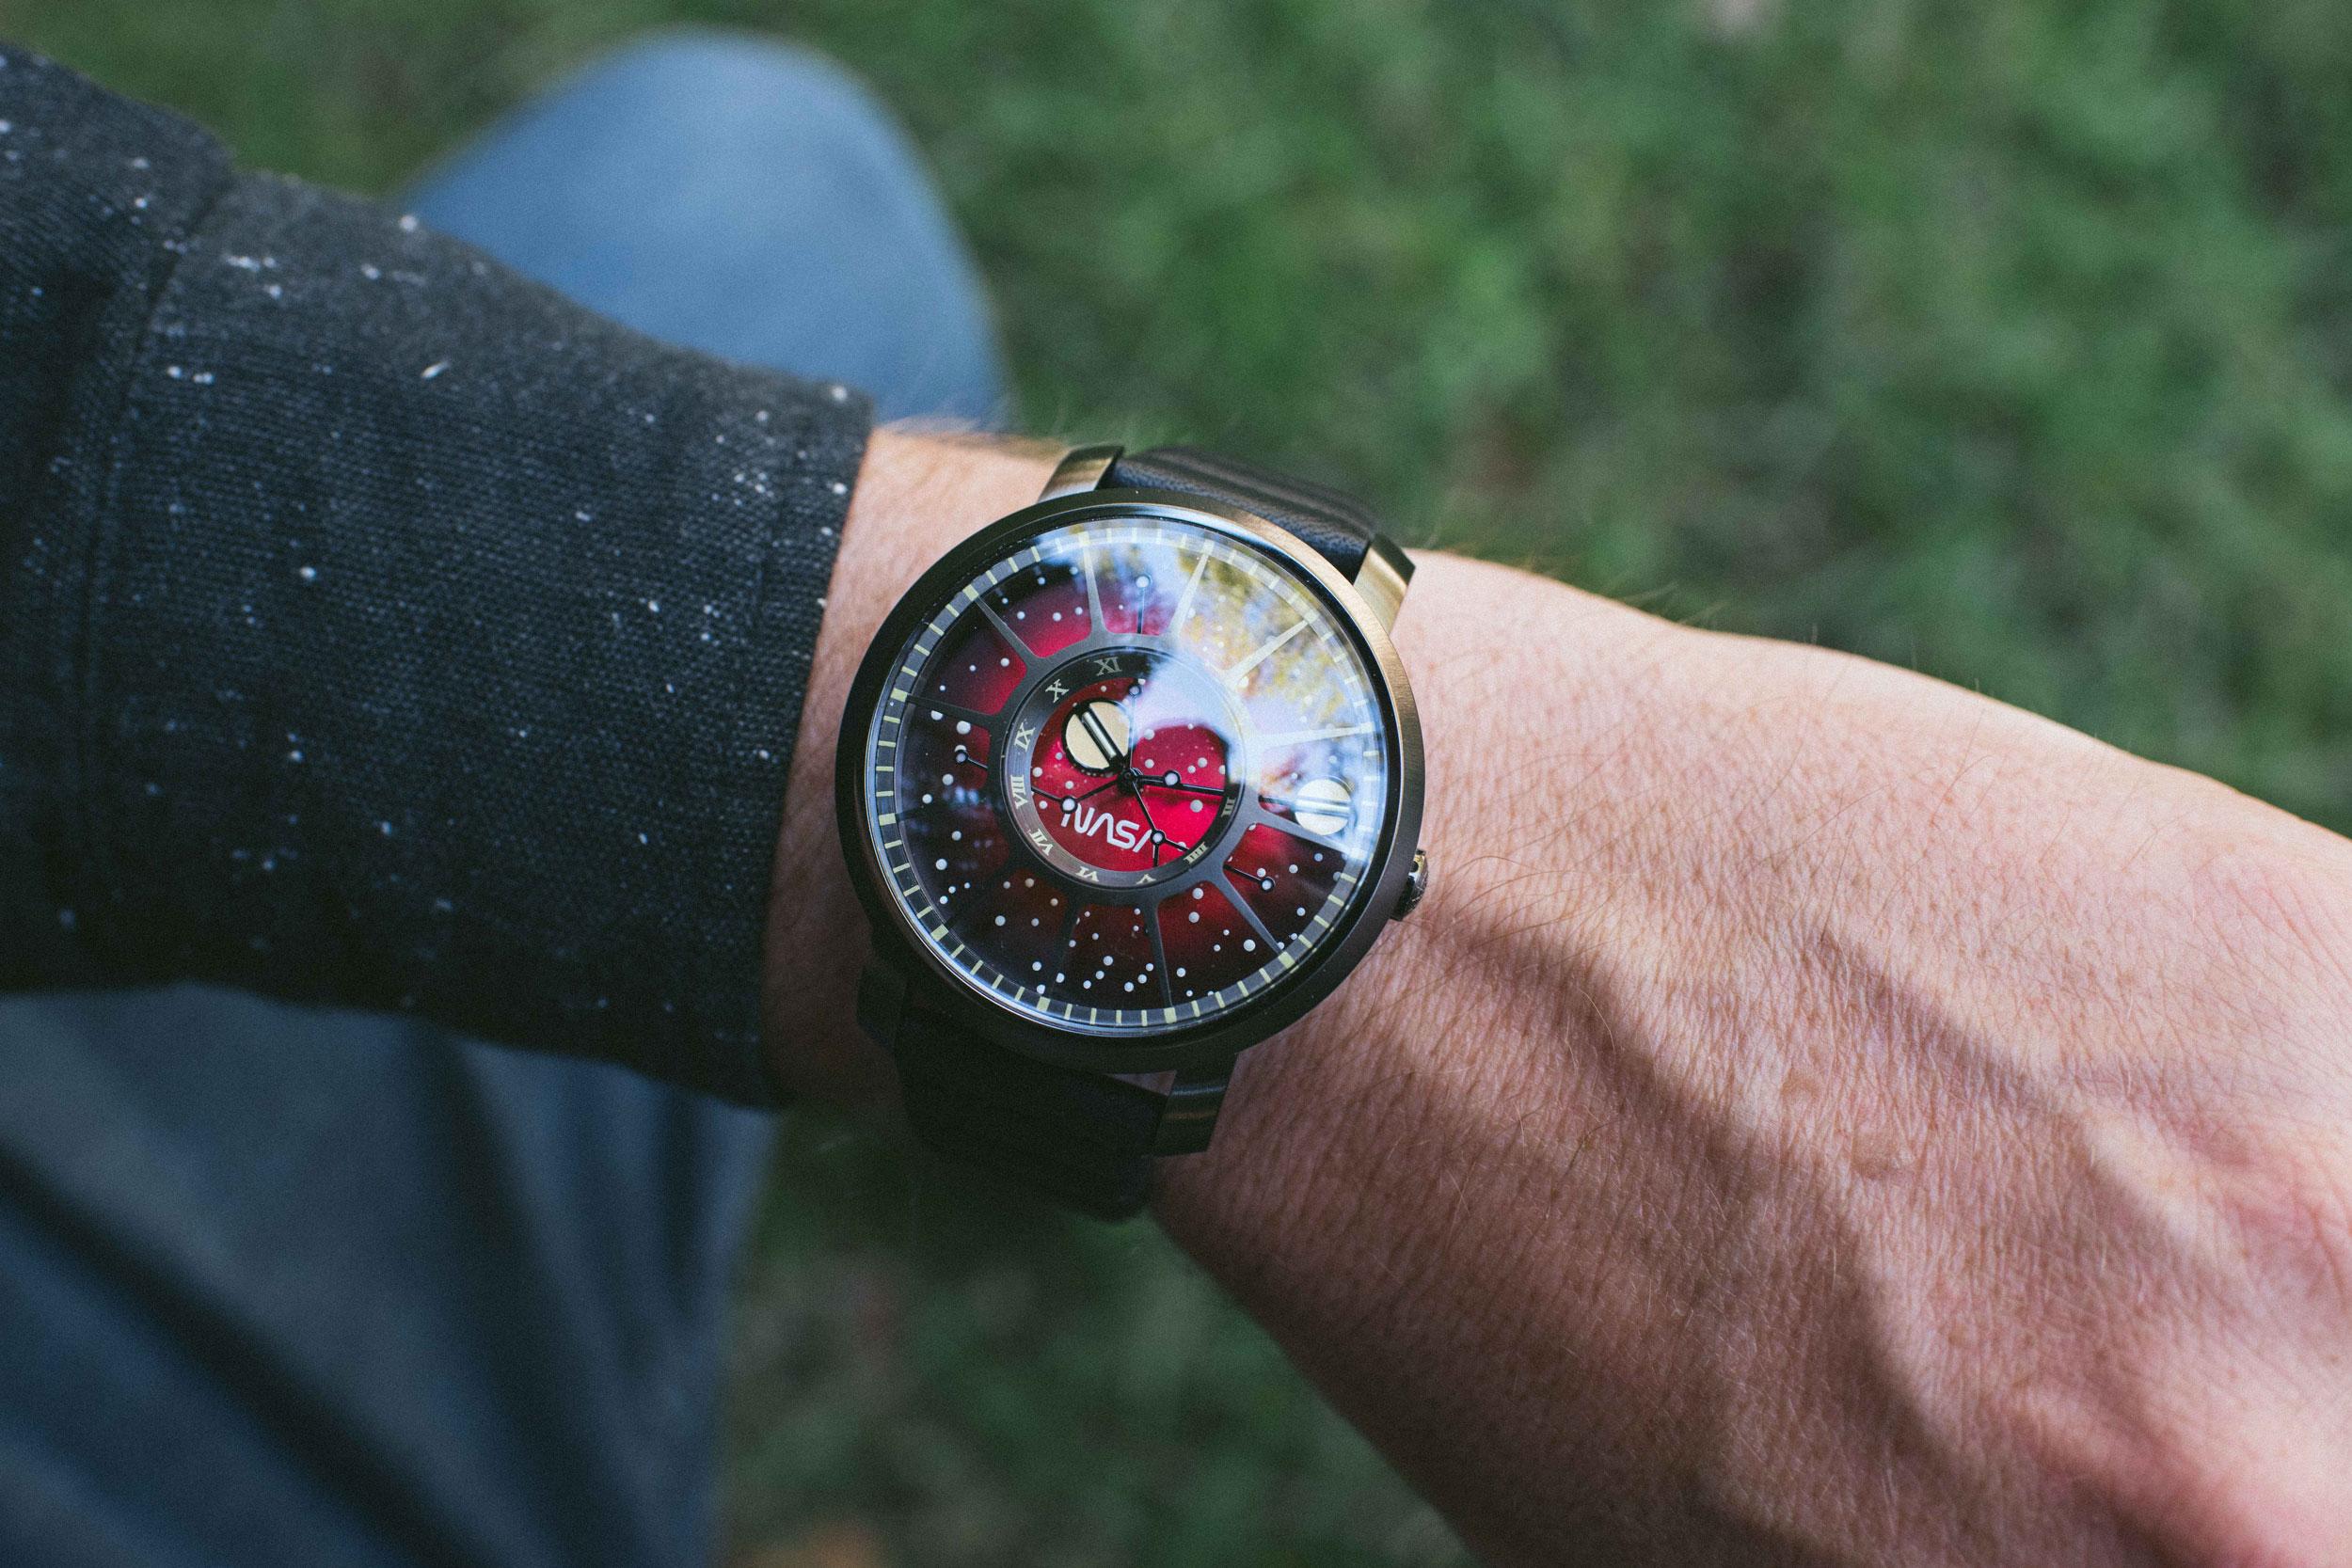 xeric-trappist-1-nasa-wrist-red-dwarf.jpg